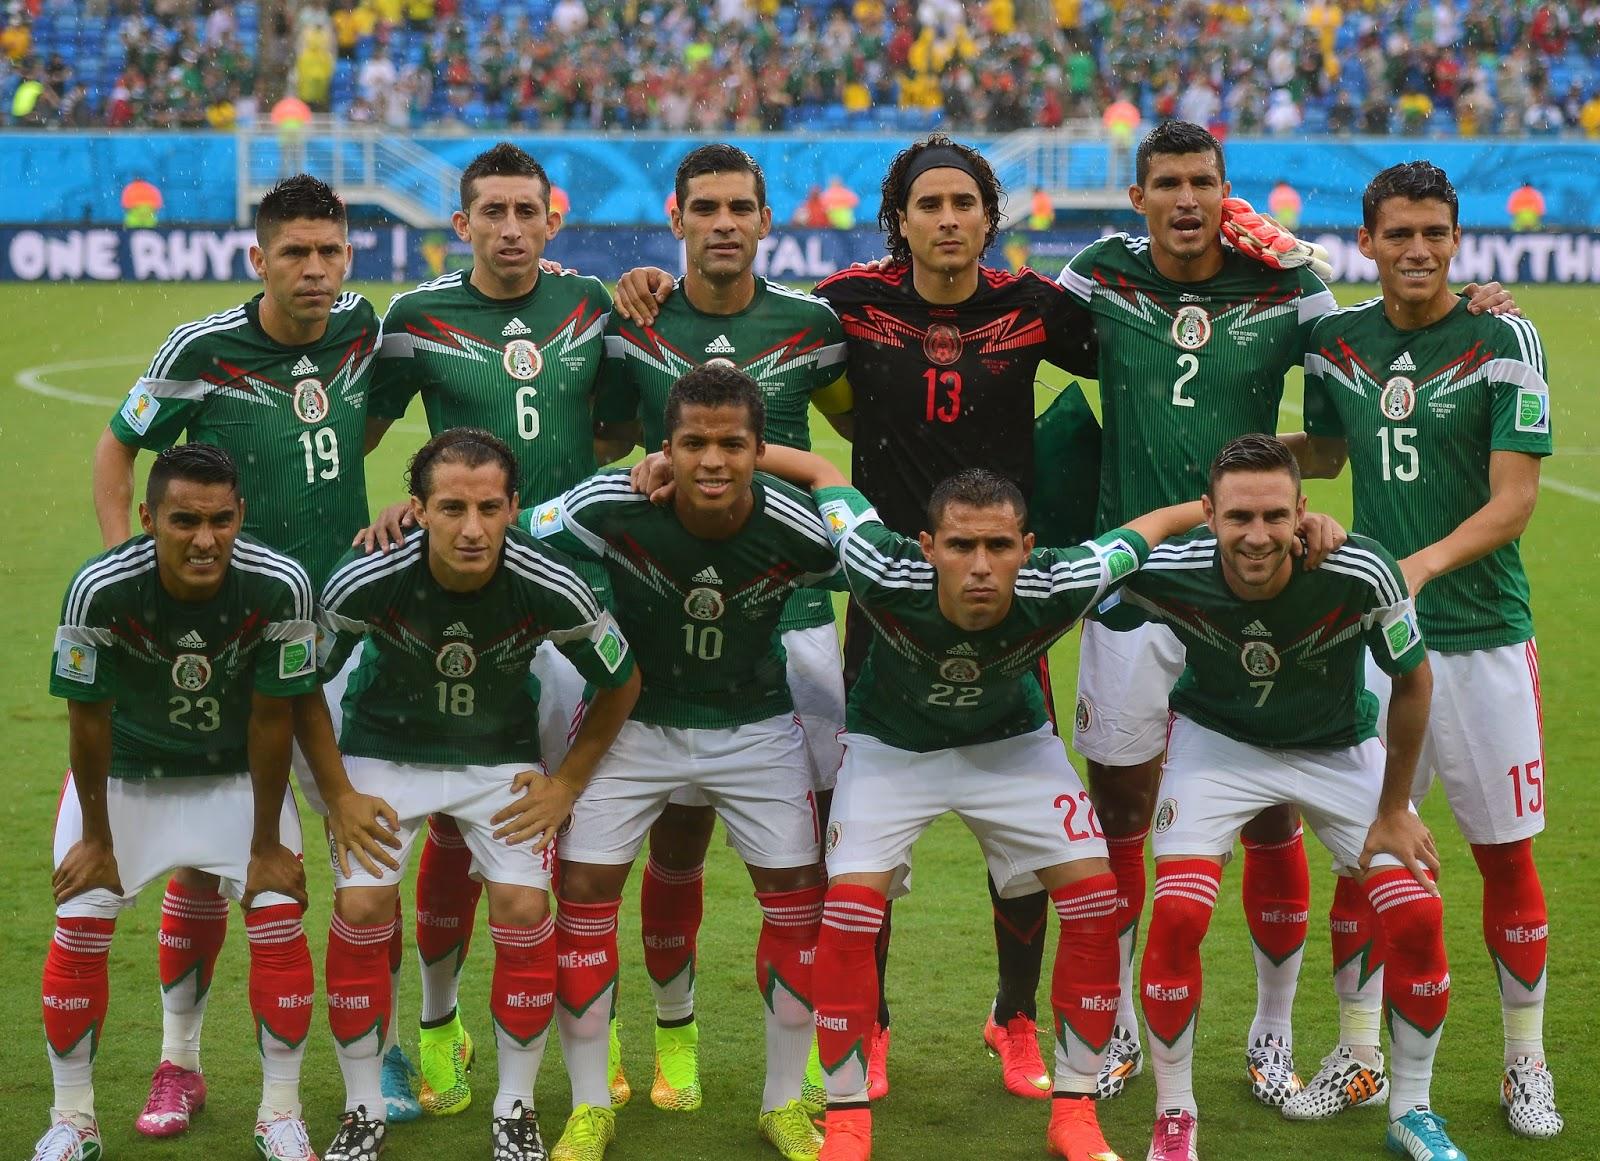 Football Group A Mexico Captain Mexico Squad Mexico vs Cameroon 1600x1161